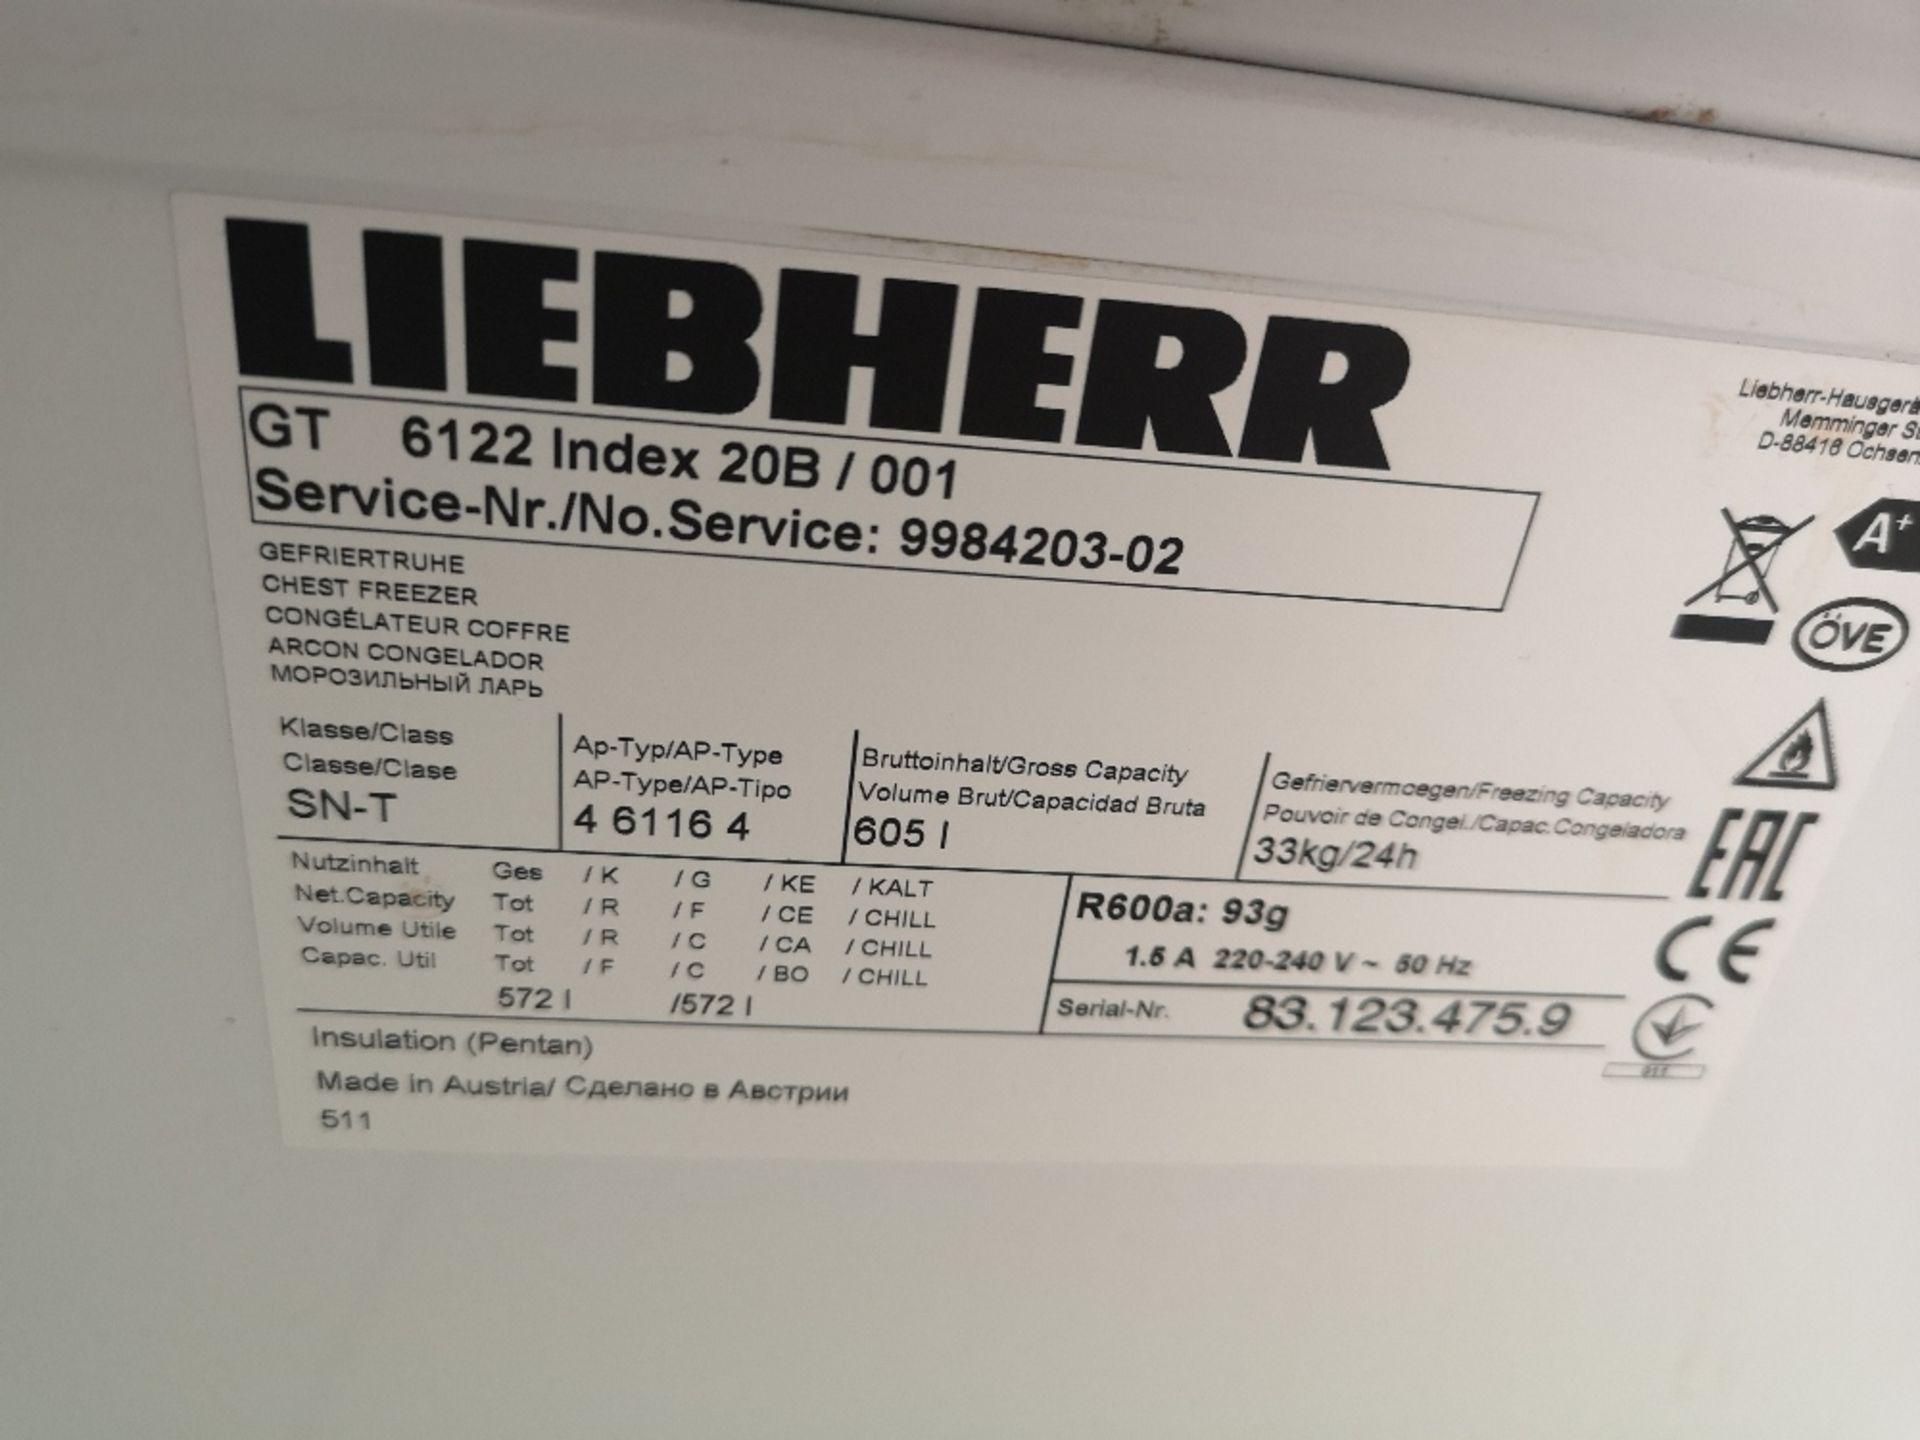 Liebherr GT 6122 Comfort Chest Freezer - Image 3 of 3